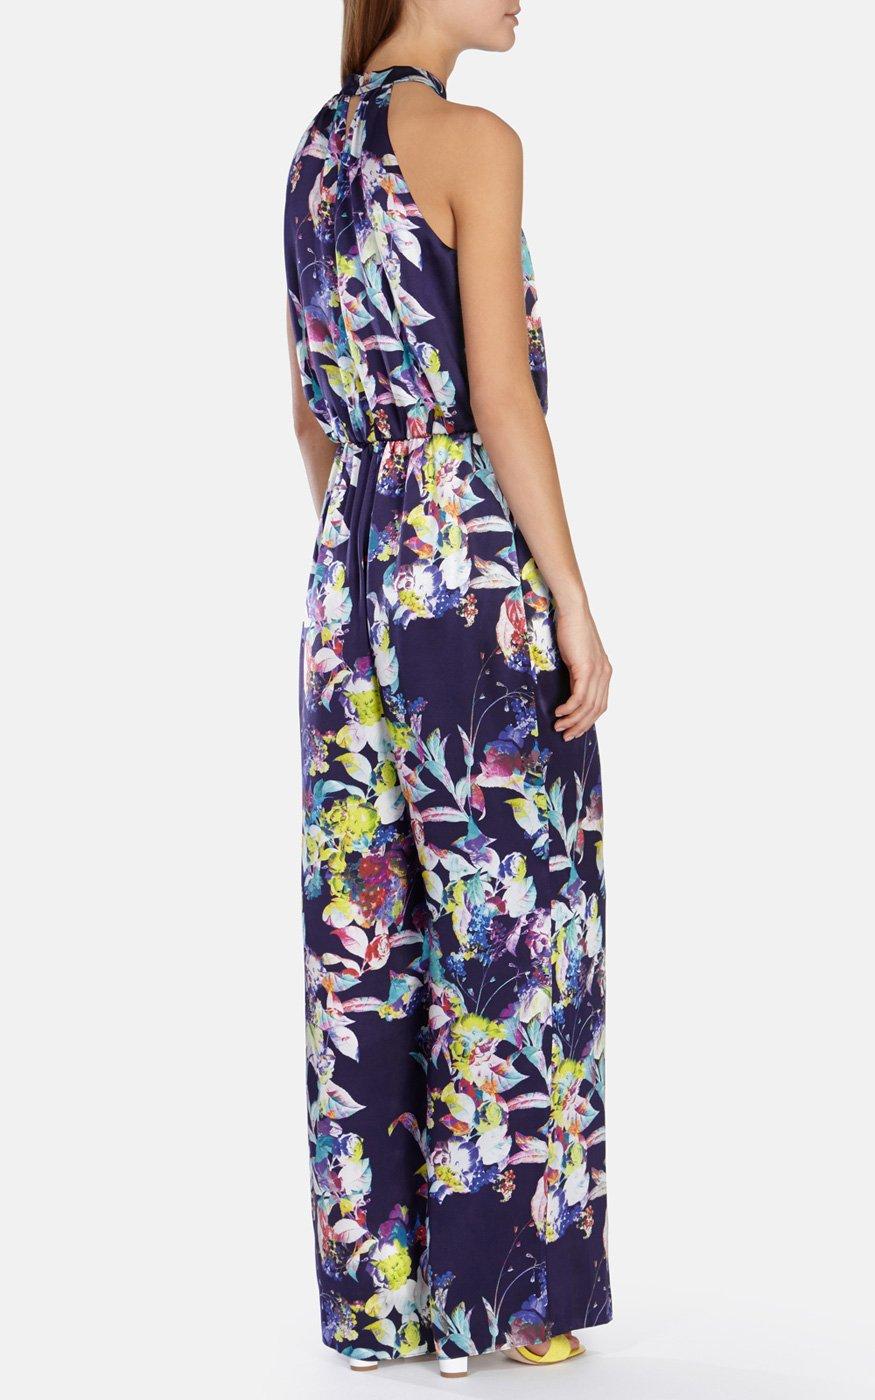 88ecd5f66ac Lyst - Karen Millen Silk Satin Floral Print Fluid Jumpsuit